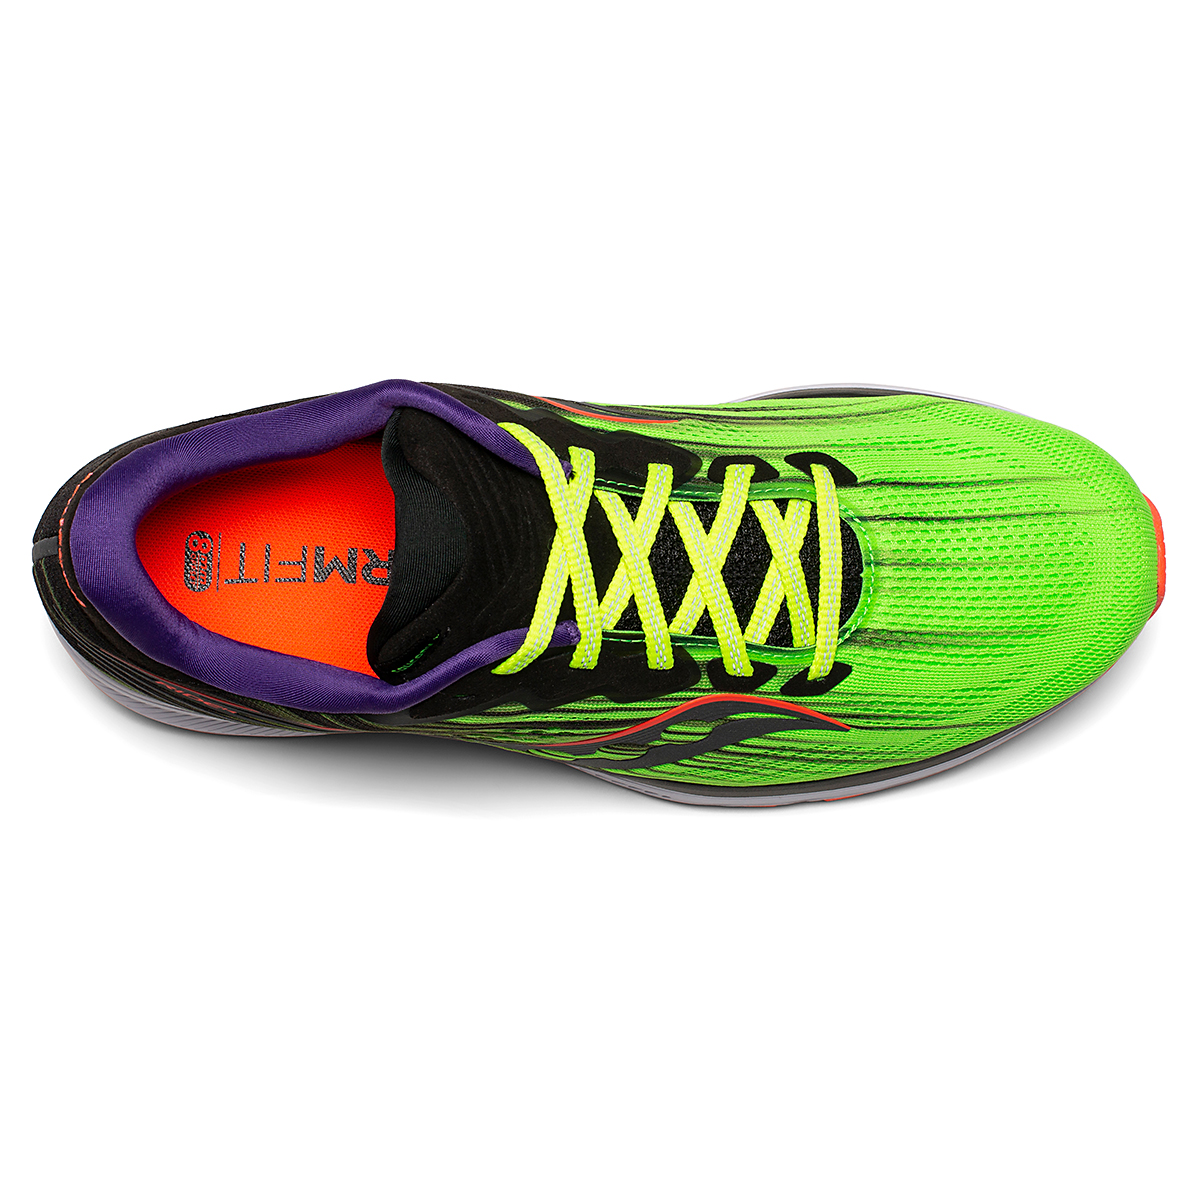 Men's Saucony Ride 14 Running Shoe - Color: Vizipro - Size: 7 - Width: Regular, Vizipro, large, image 3